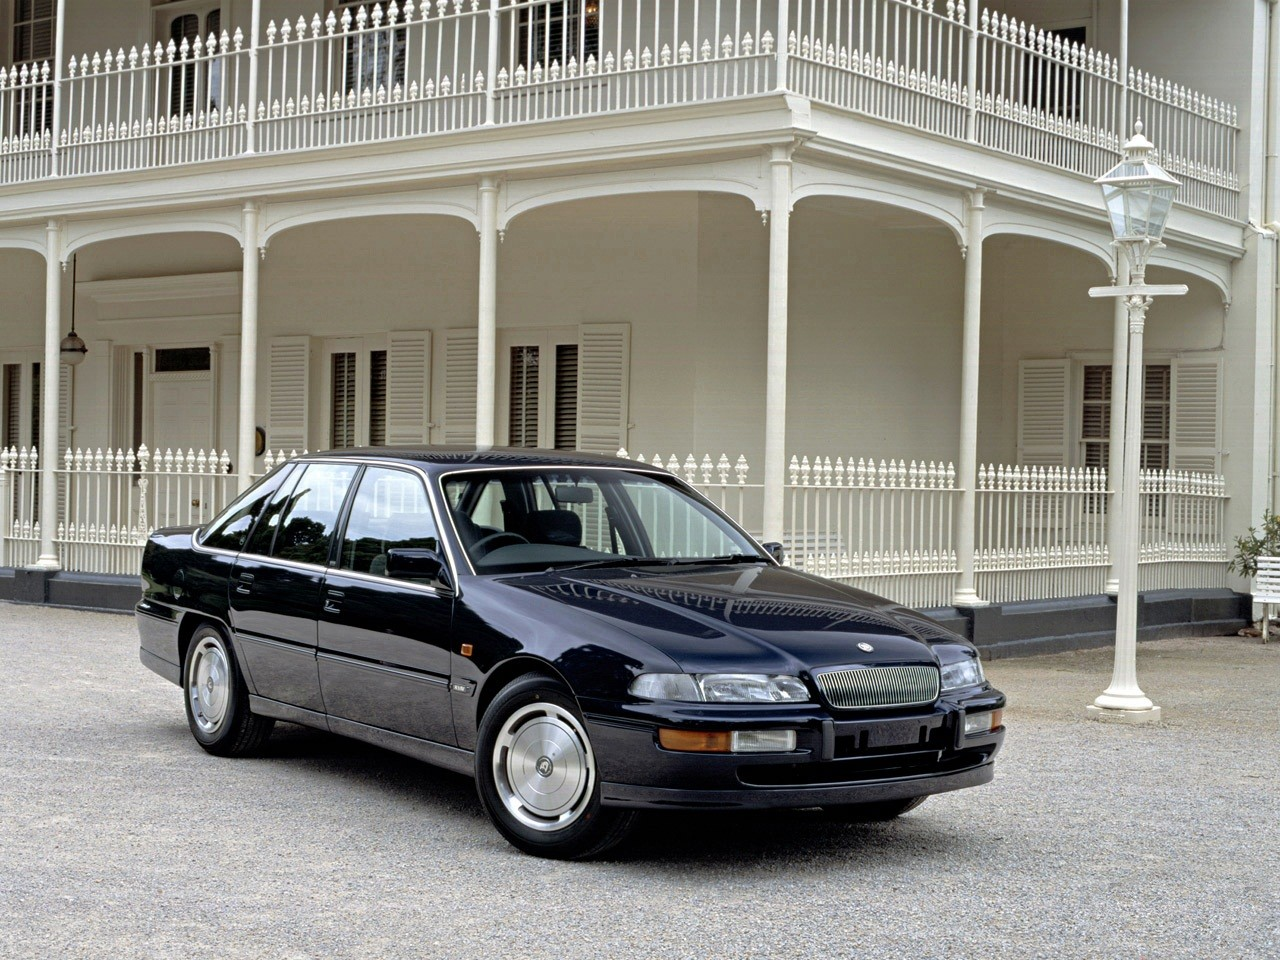 1994 HSV Grange VR